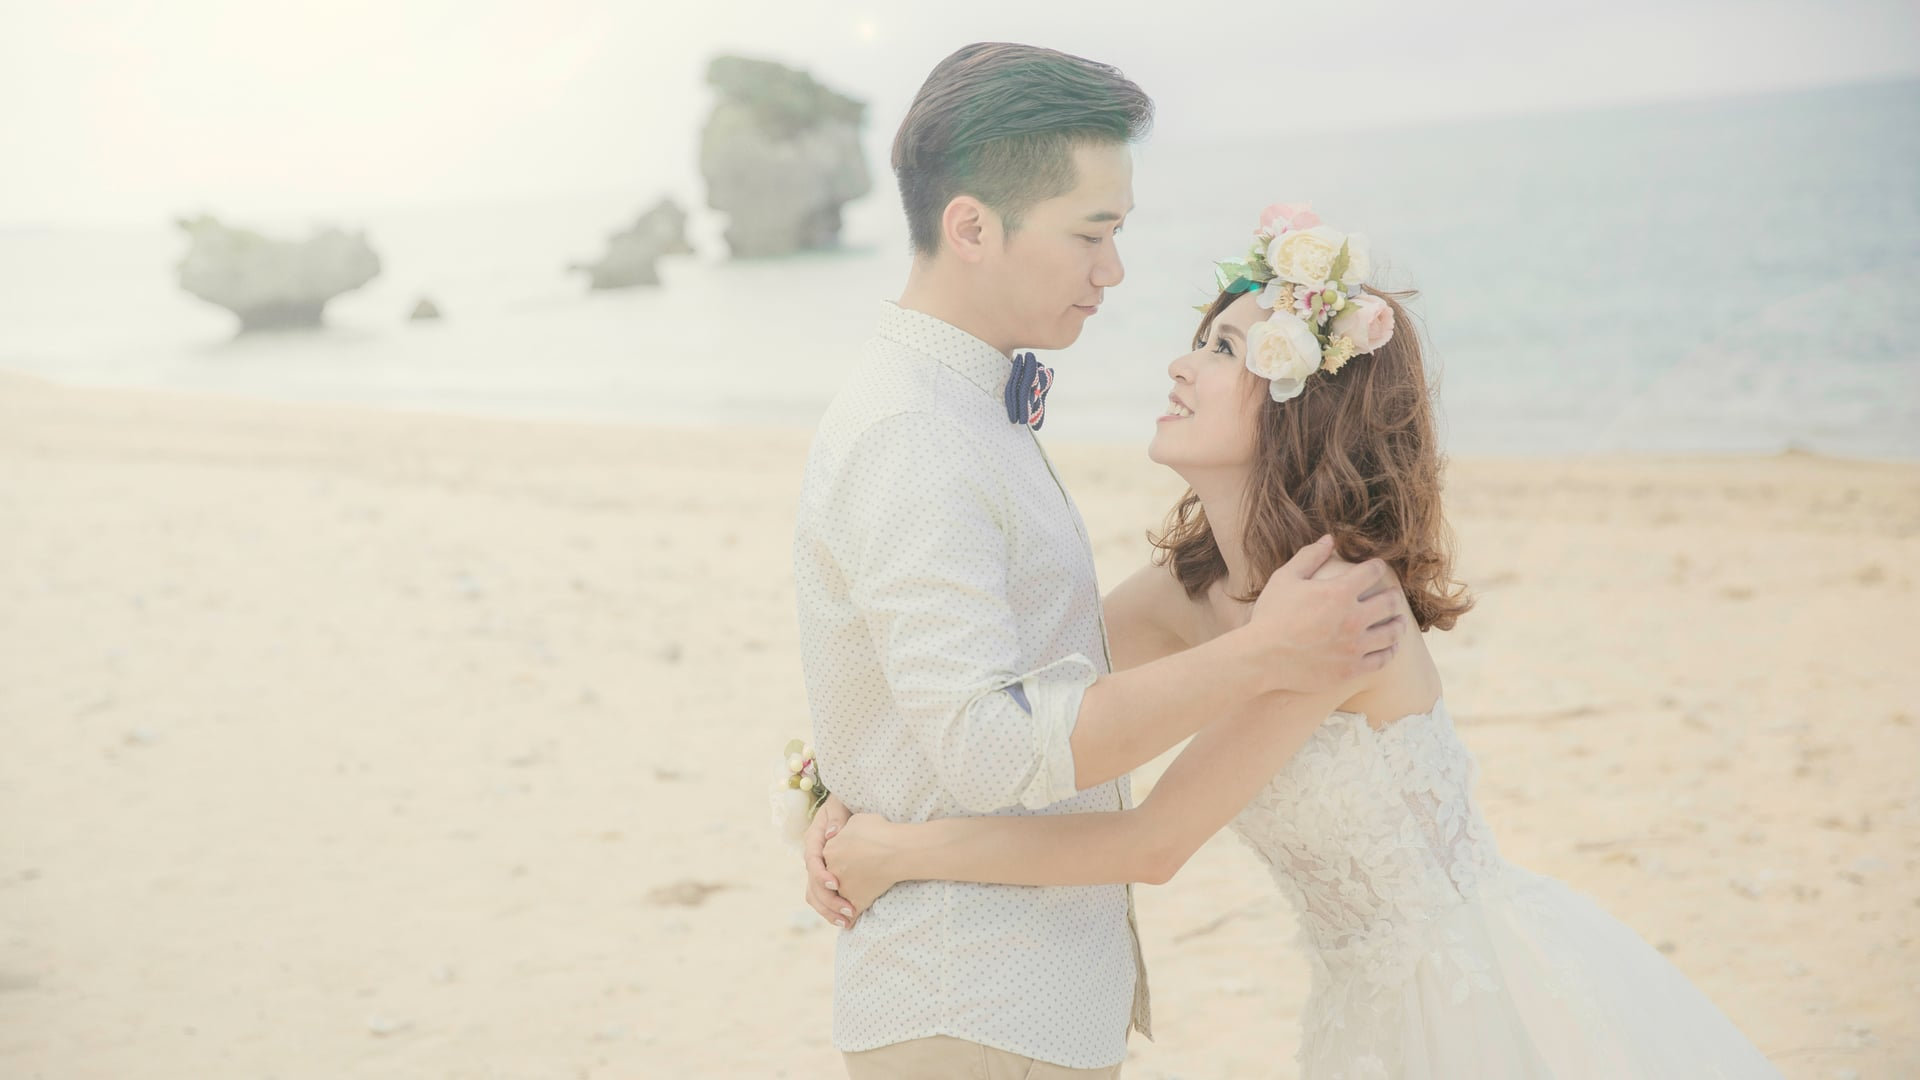 Yeh-Hung & Chih-Ying // PreWedding婚紗側錄 @ Okinawa沖繩